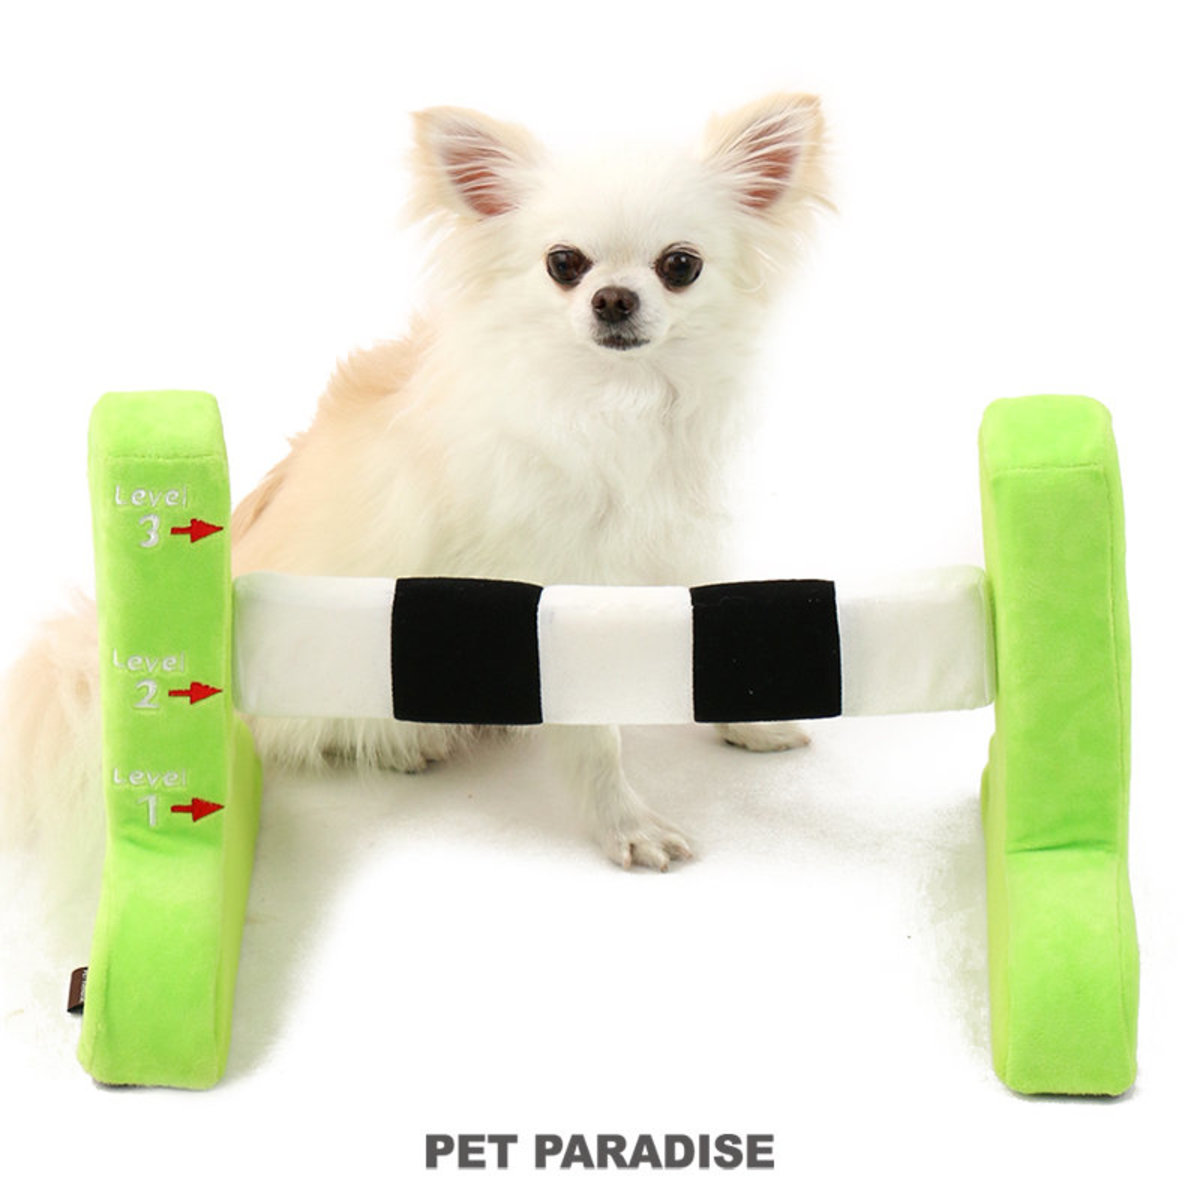 Pyon Pyon Hurdle Toy for Dogs